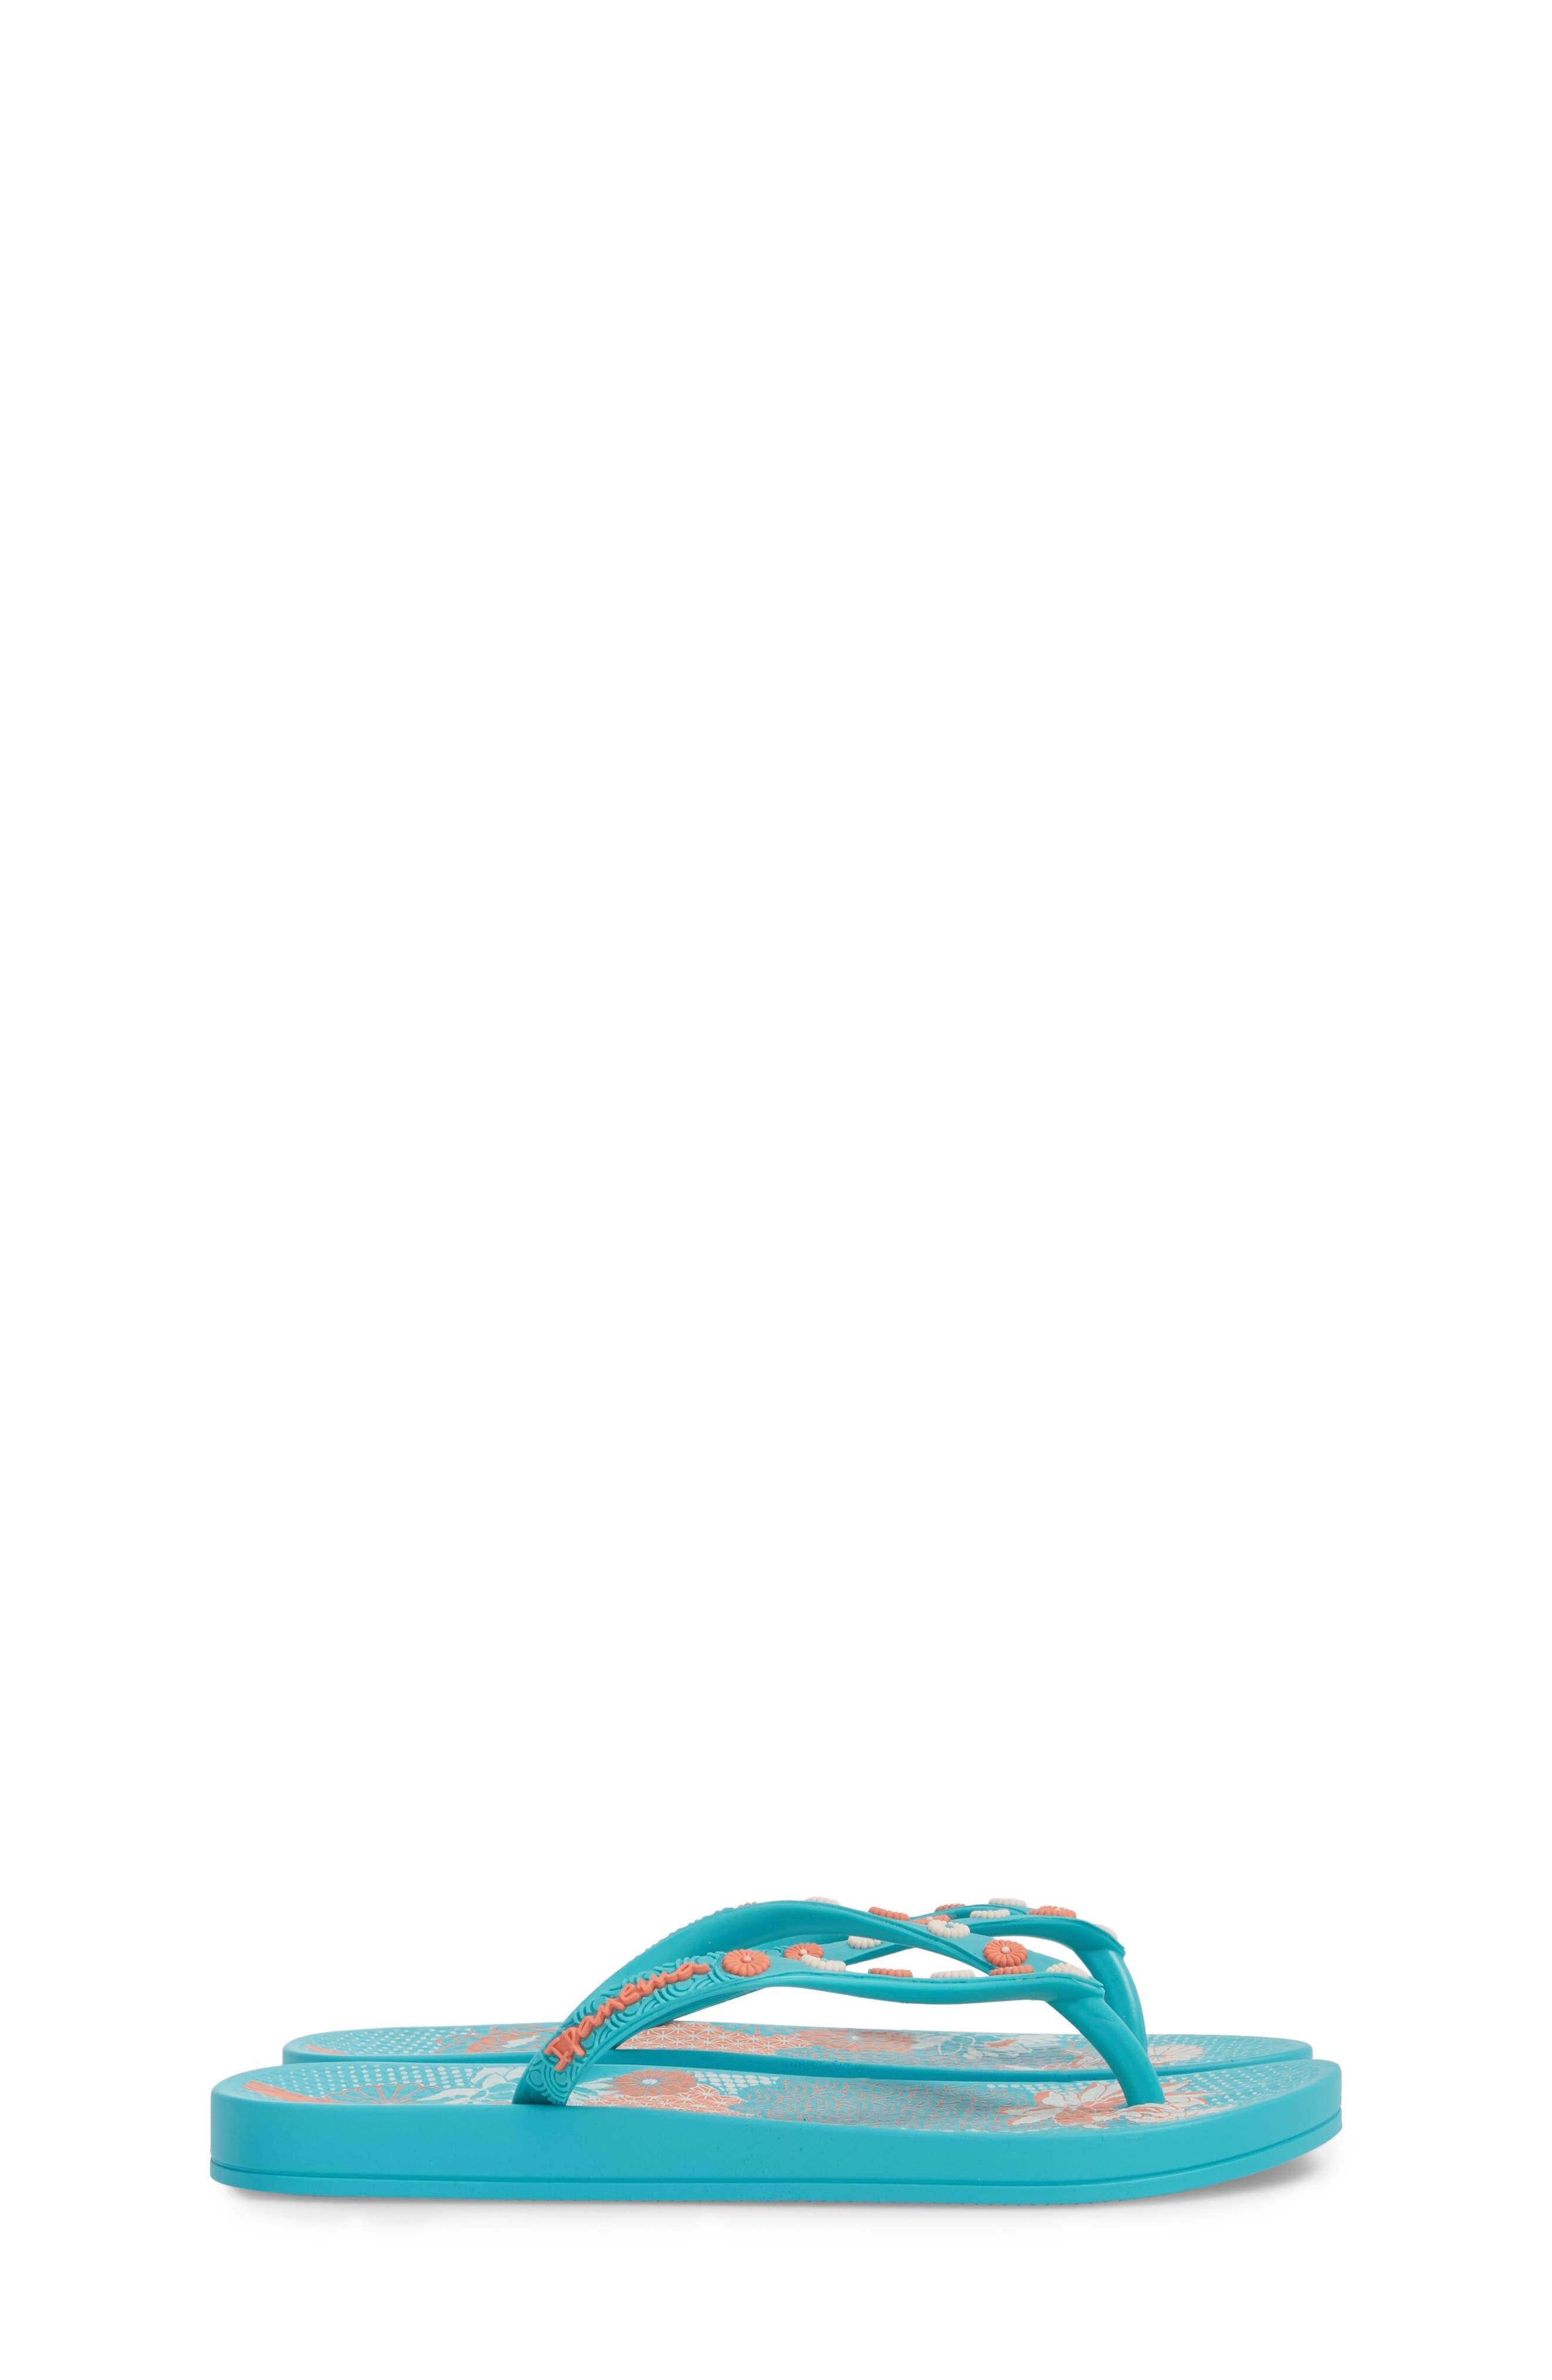 Ana Lovely Flip Flop,                             Alternate thumbnail 8, color,